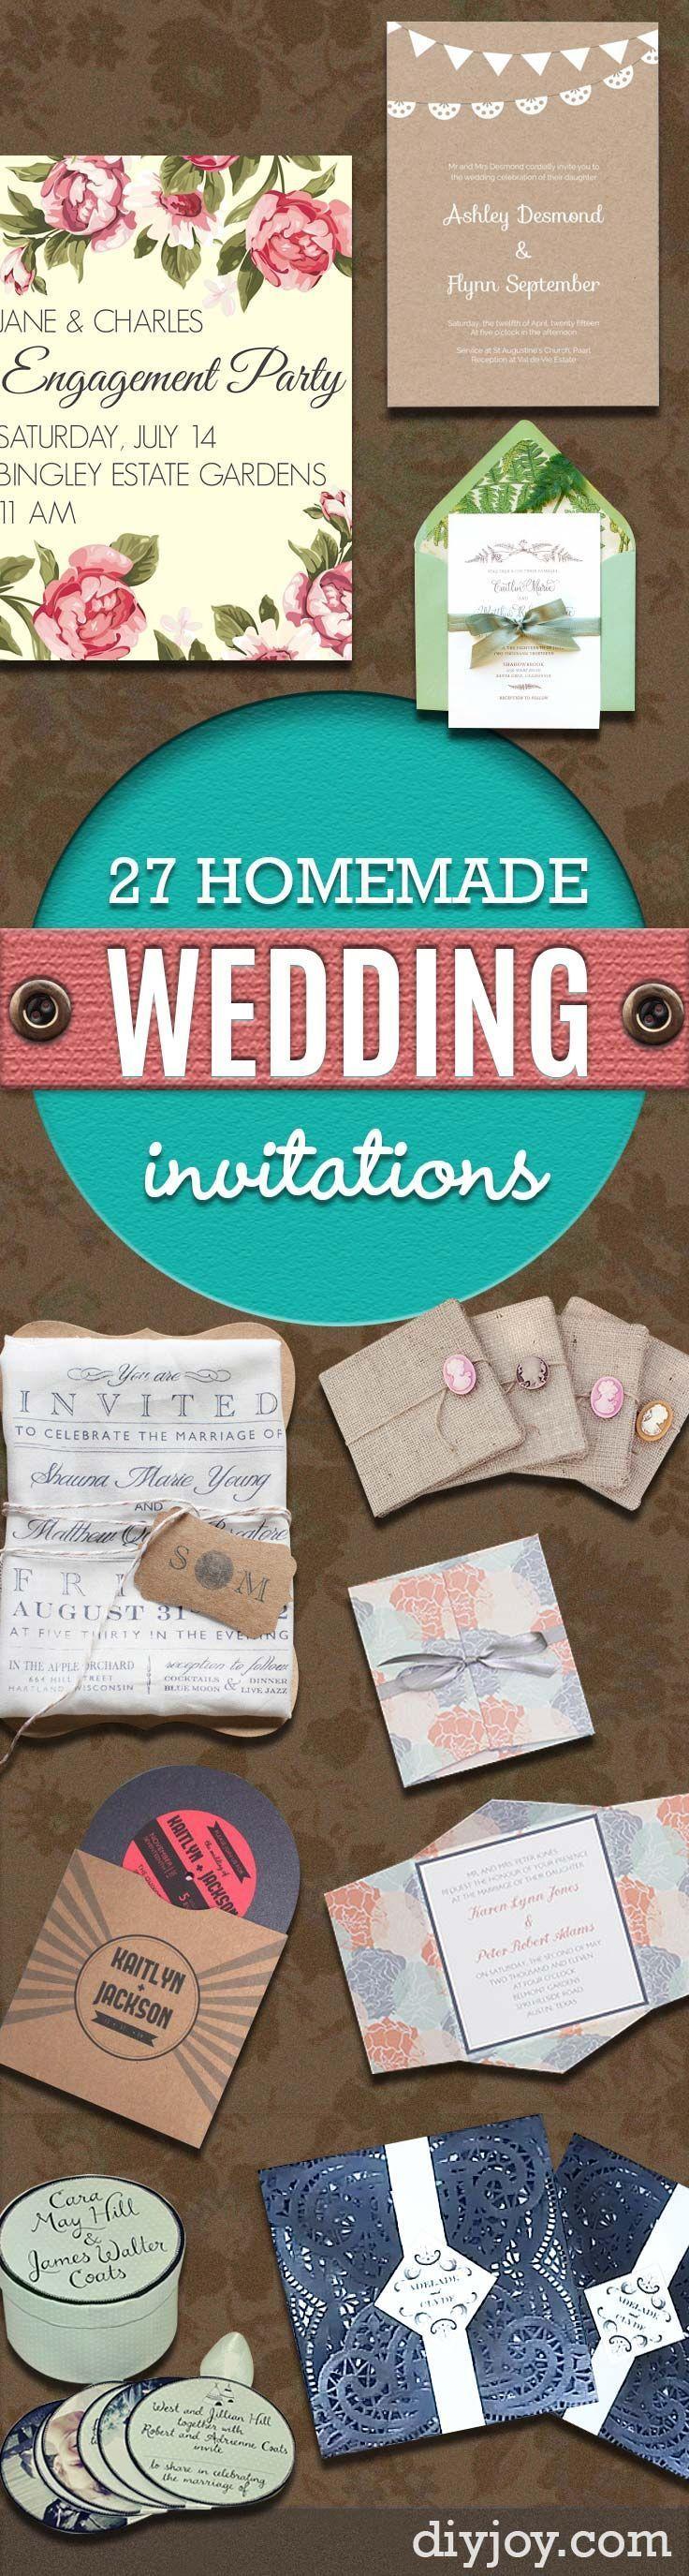 DIY Wedding Invitiations - Templates, Free Printables and Wording | Tutorials for Unique, Rustic, Elegant and Vintage Homemade Invites http://diyjoy.com/diy-wedding-invitations